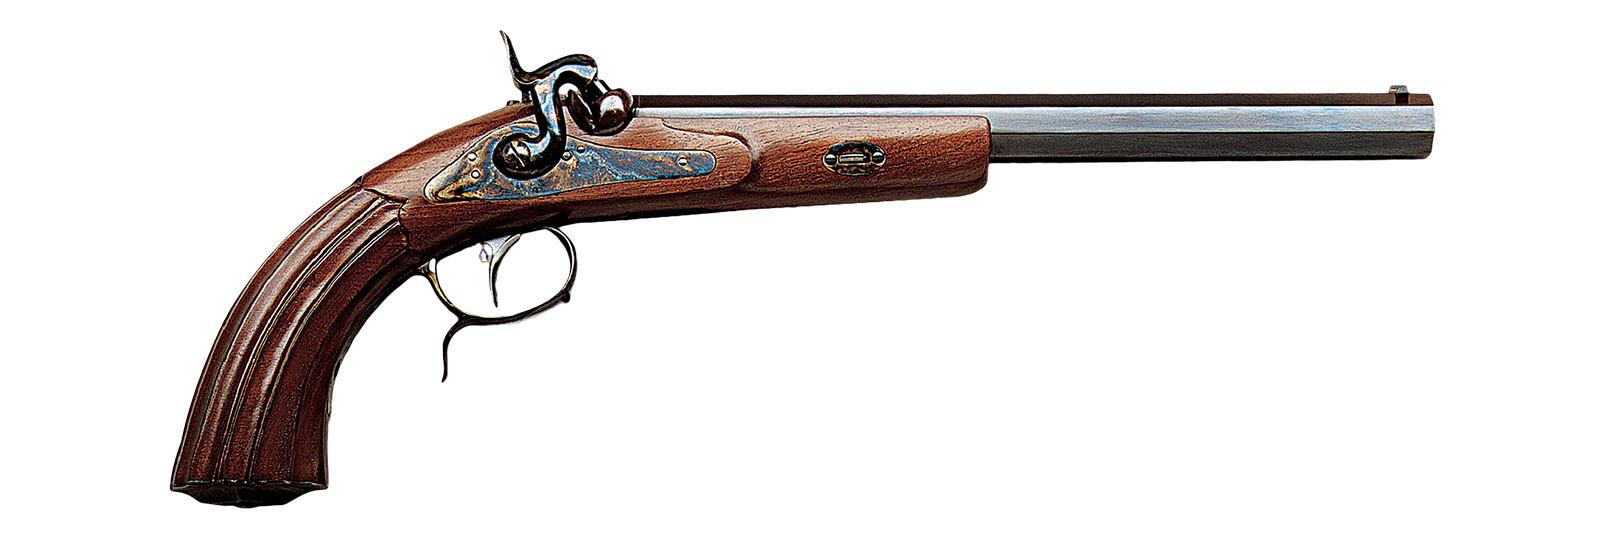 Pistola Mang in Graz Match